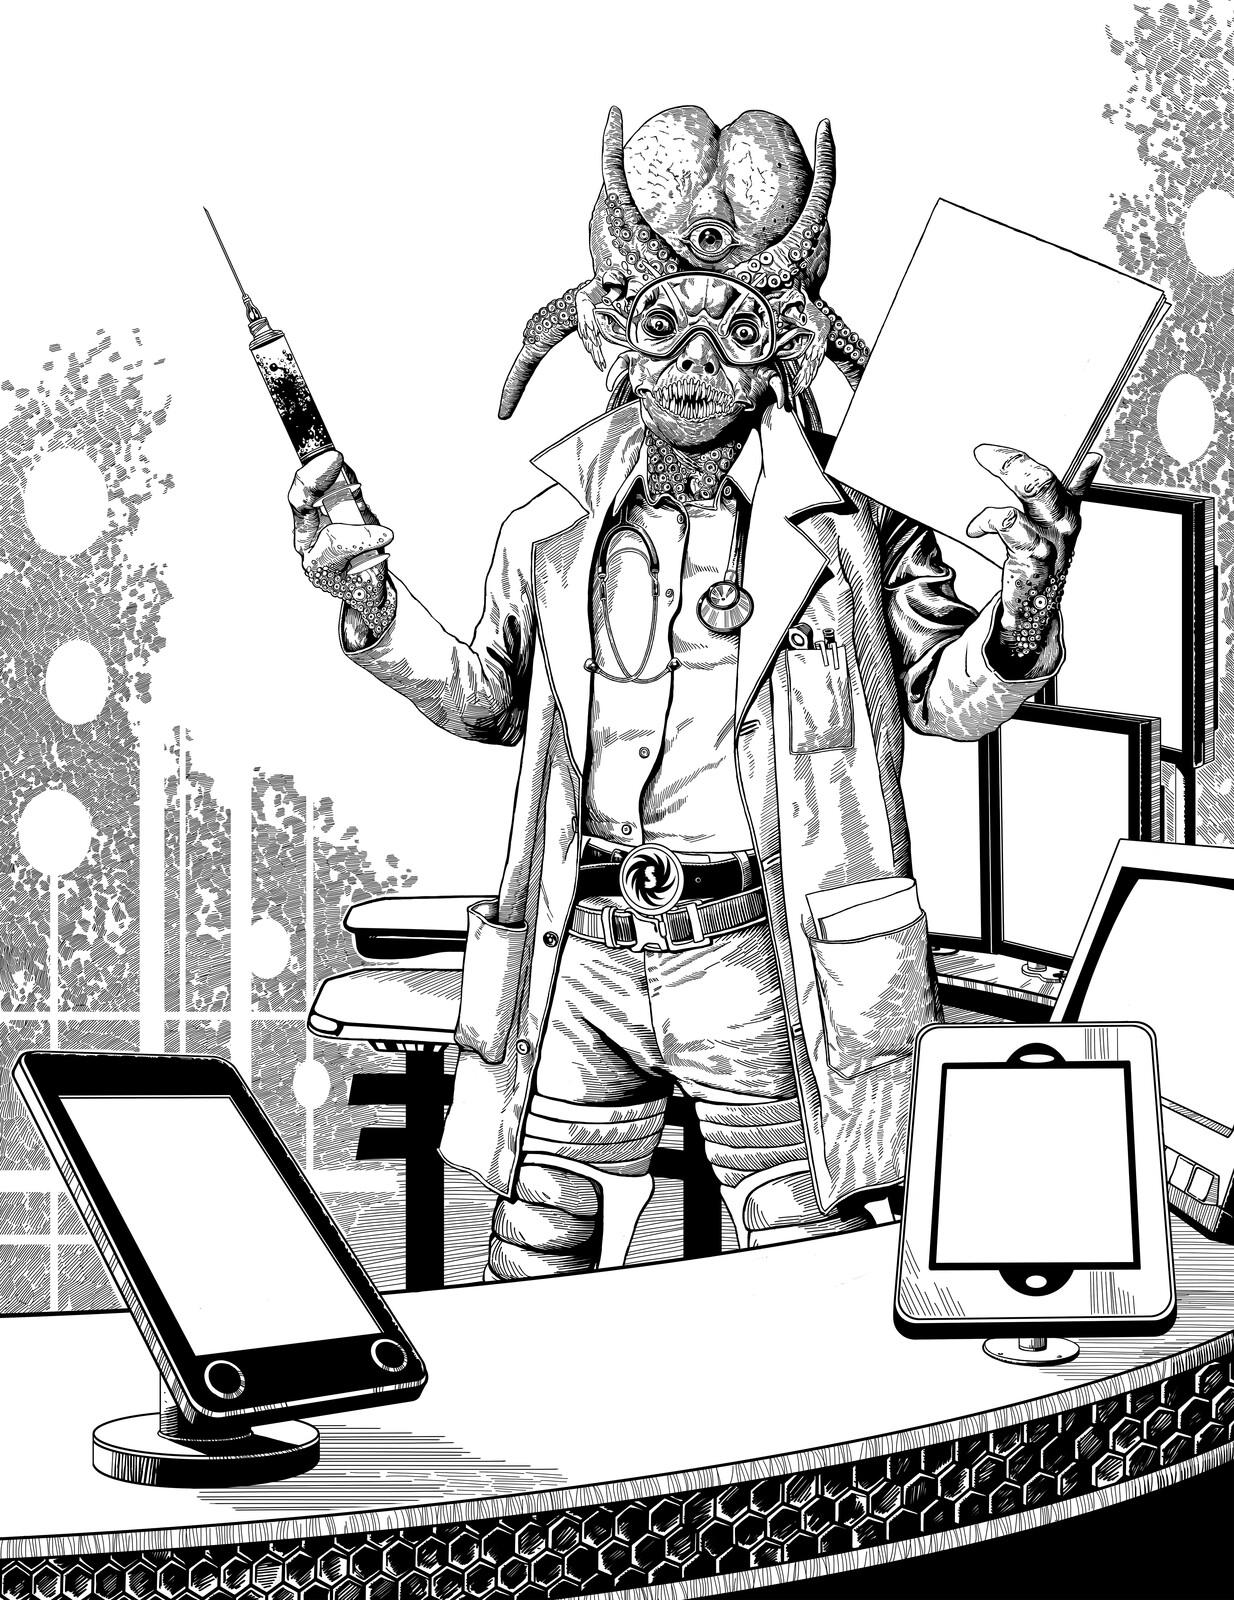 Doc Zot Illustration 1 Spacewarpcomic.com